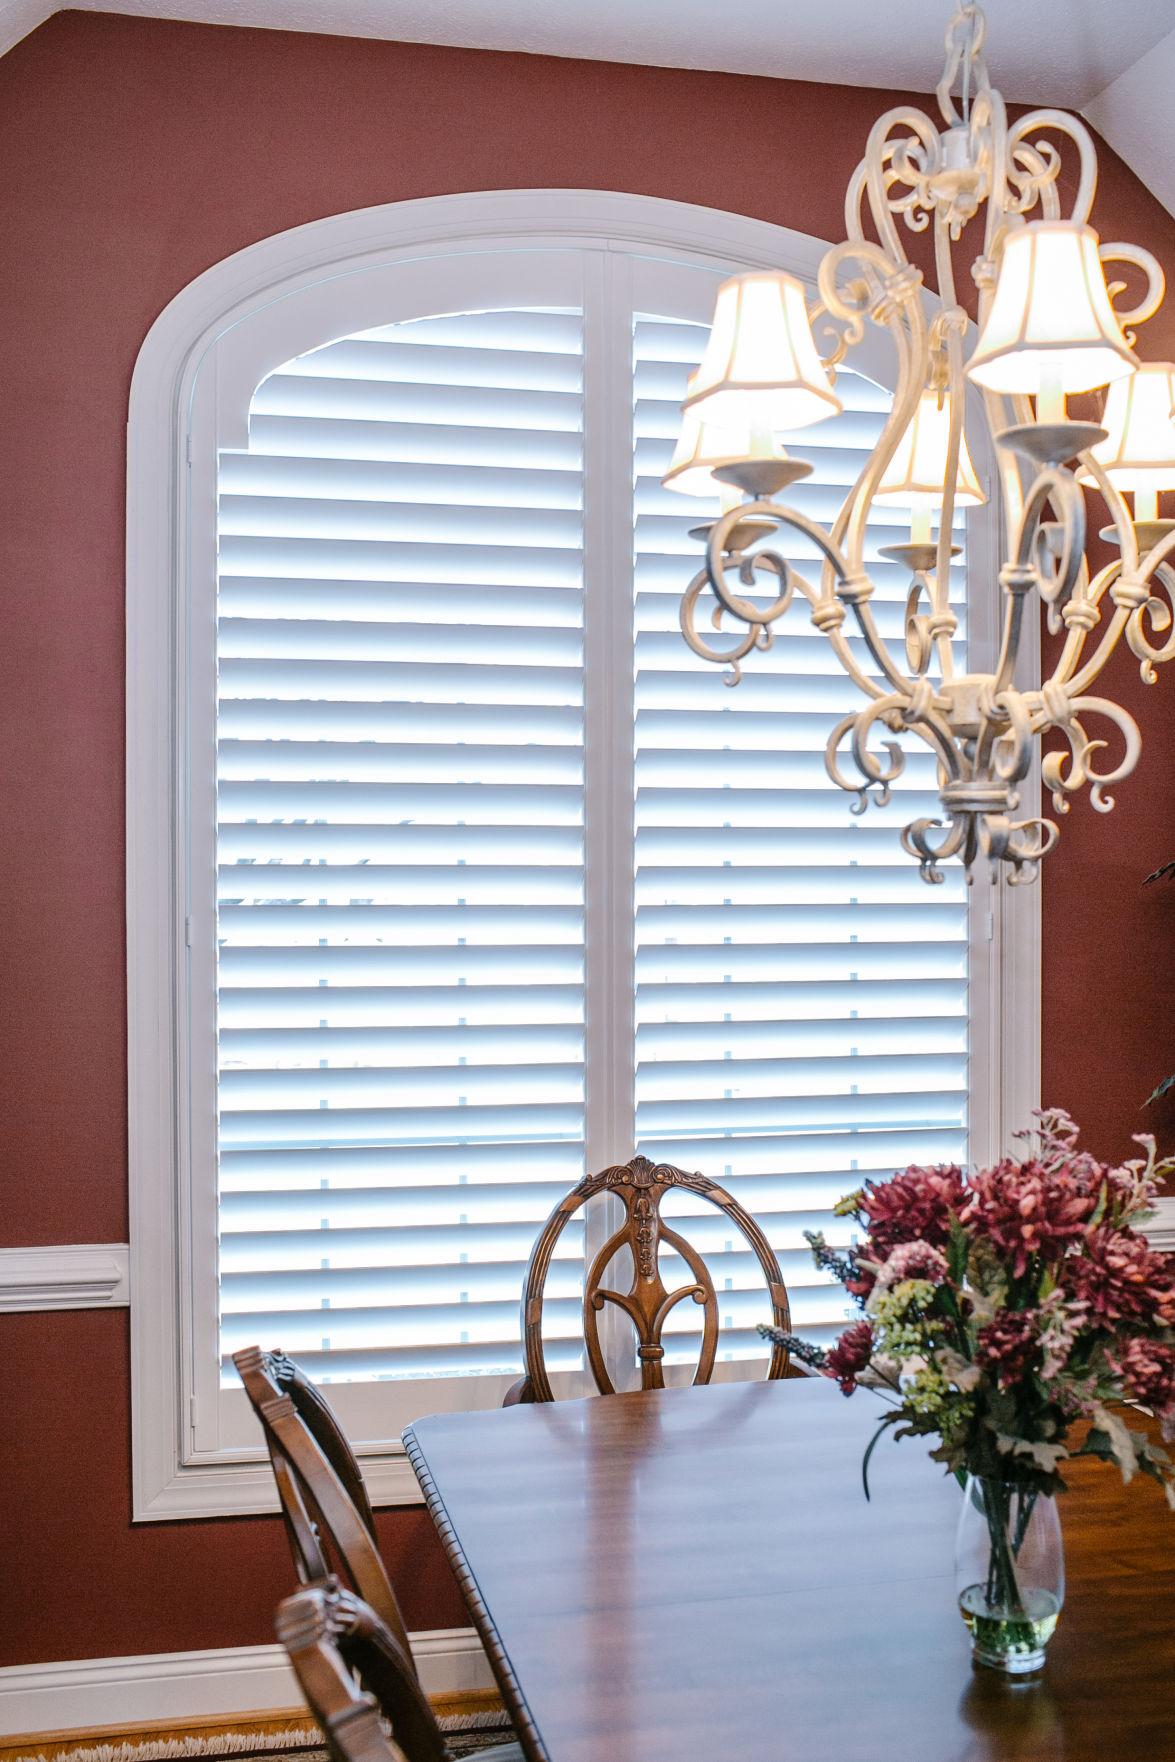 curtains blinds bath blinds shades forest va rh newsadvance com